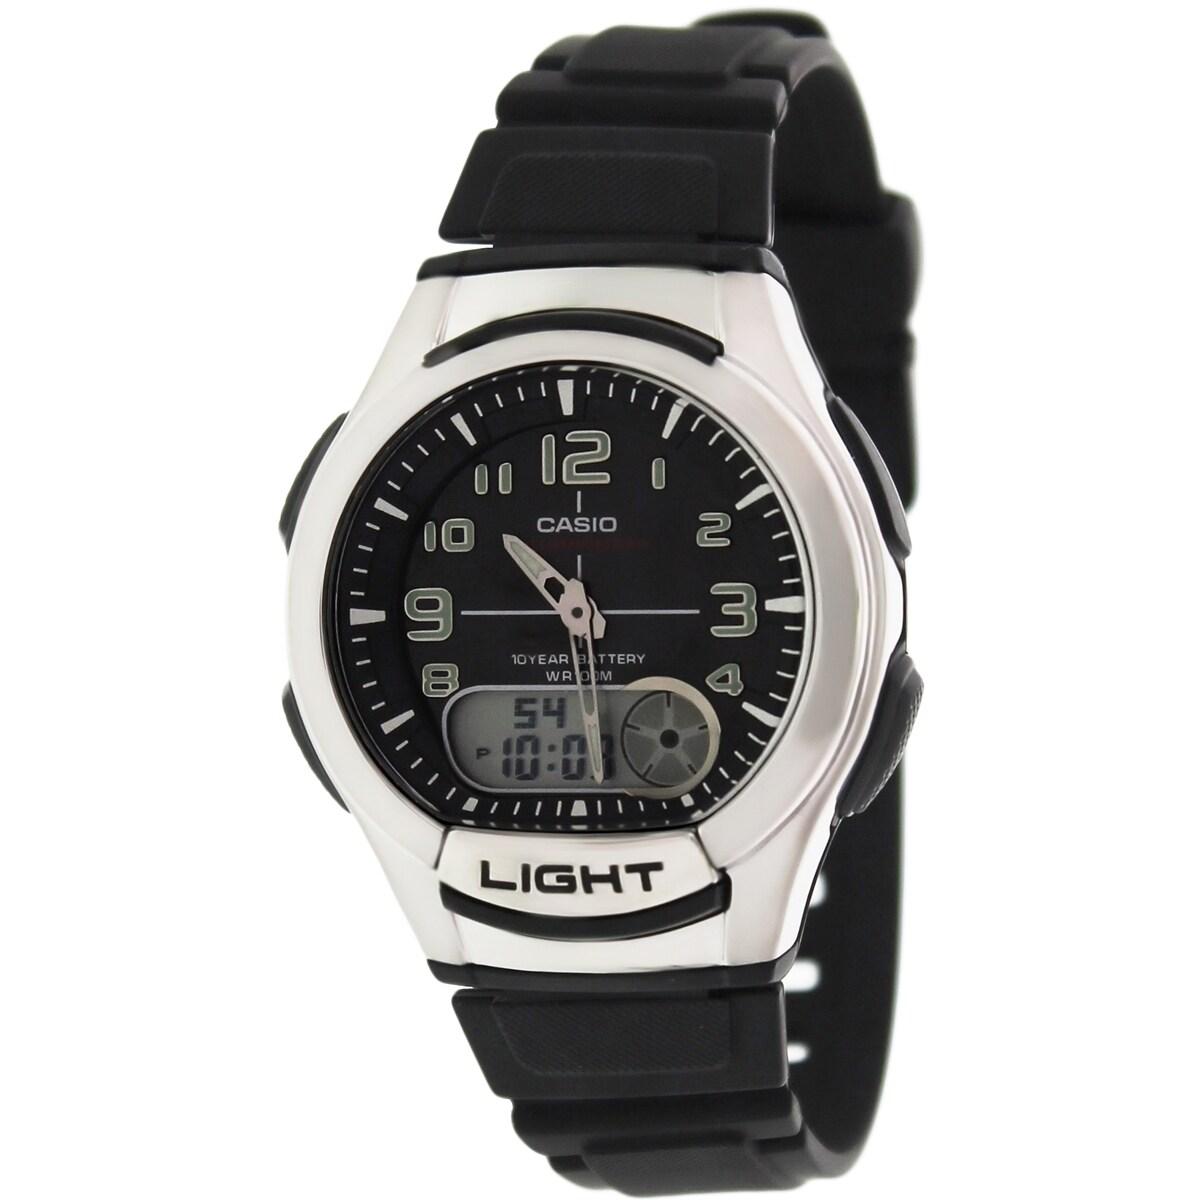 Casio Men's Core AQ180W-1BV Black Resin Quartz Watch (AQ1...